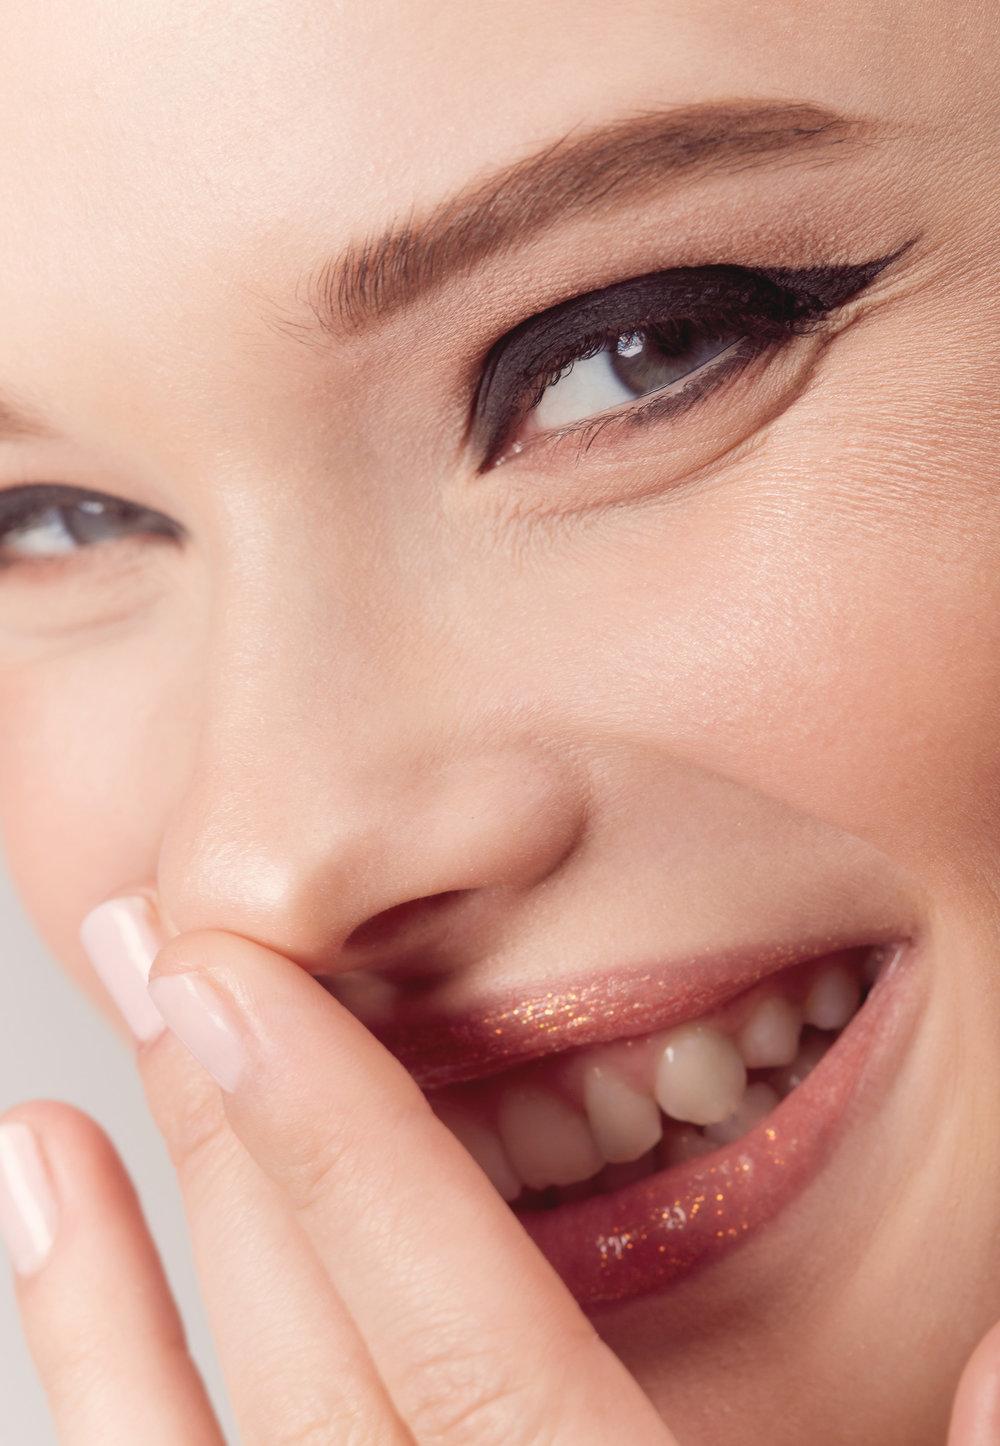 beauty_makeup_photographer_barcelona_leandro_crespi.jpg